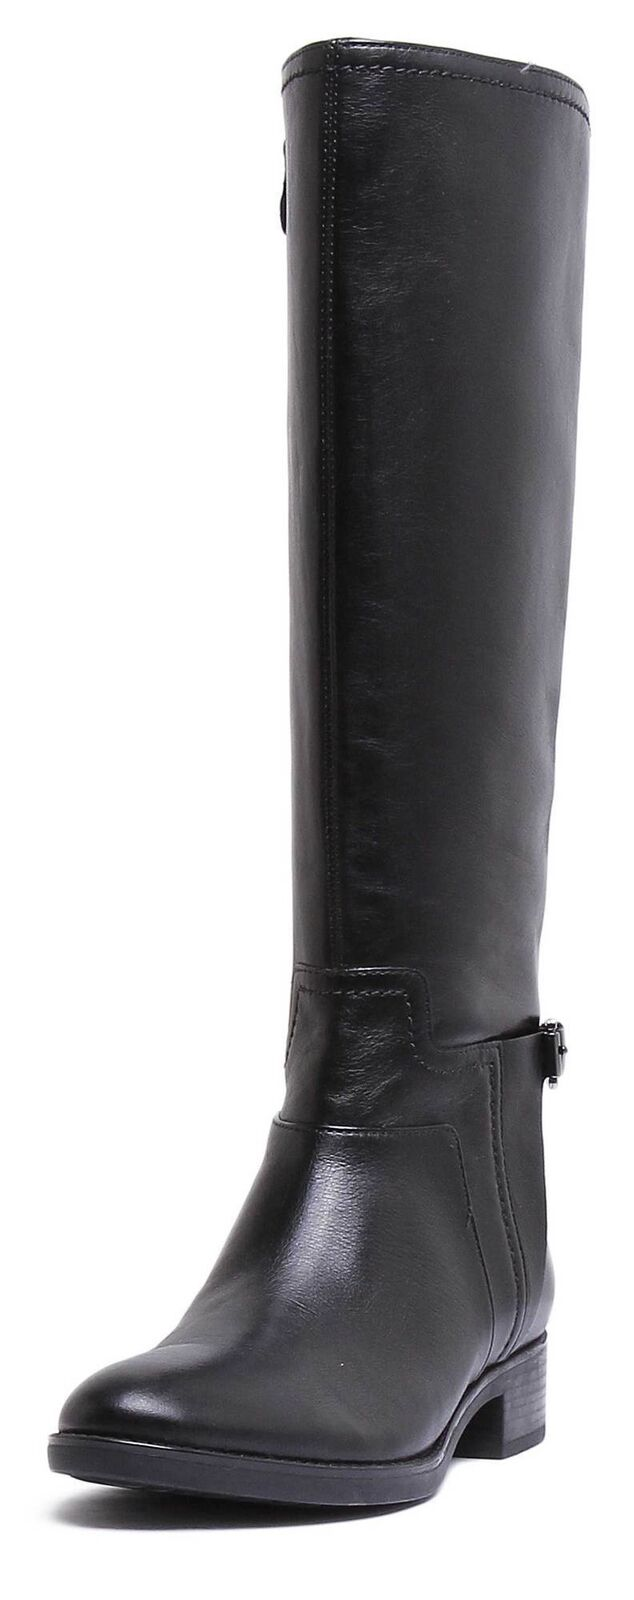 Geox Felicity Womens Leather Matt Black Long Long Long Riding Boots UK size 3 - 8 d48b0b